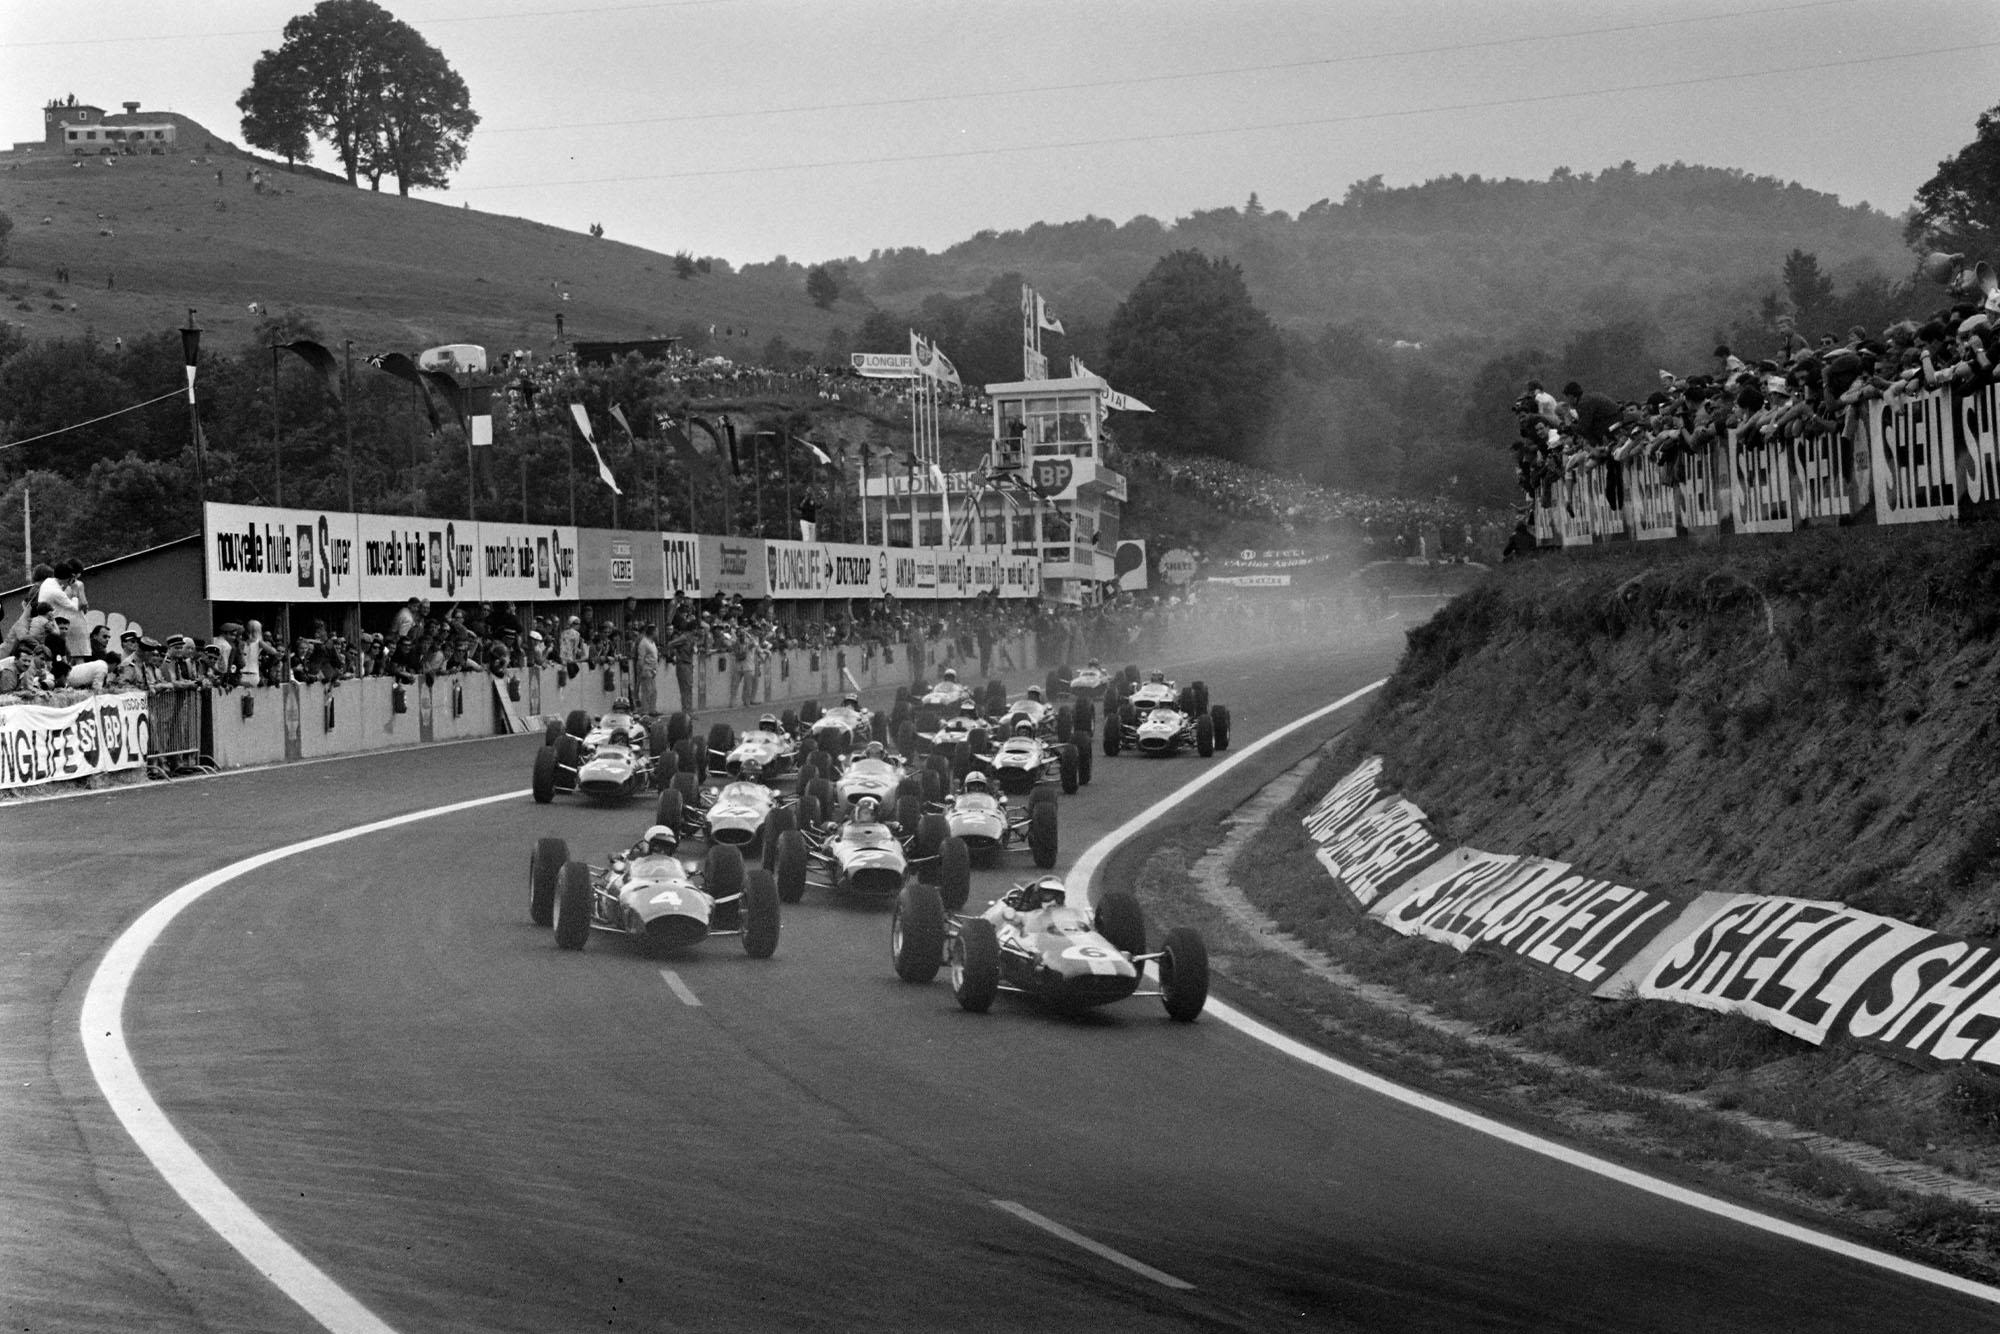 Jim Clark, Lotus 25 Climax, leads Lorenzo Bandini, Ferrari 1512, Jackie Stewart, BRM P261, Dan Gurney, Brabham BT11 Climax, John Surtees, Ferrari 158, and the rest of the field at the start of the race.